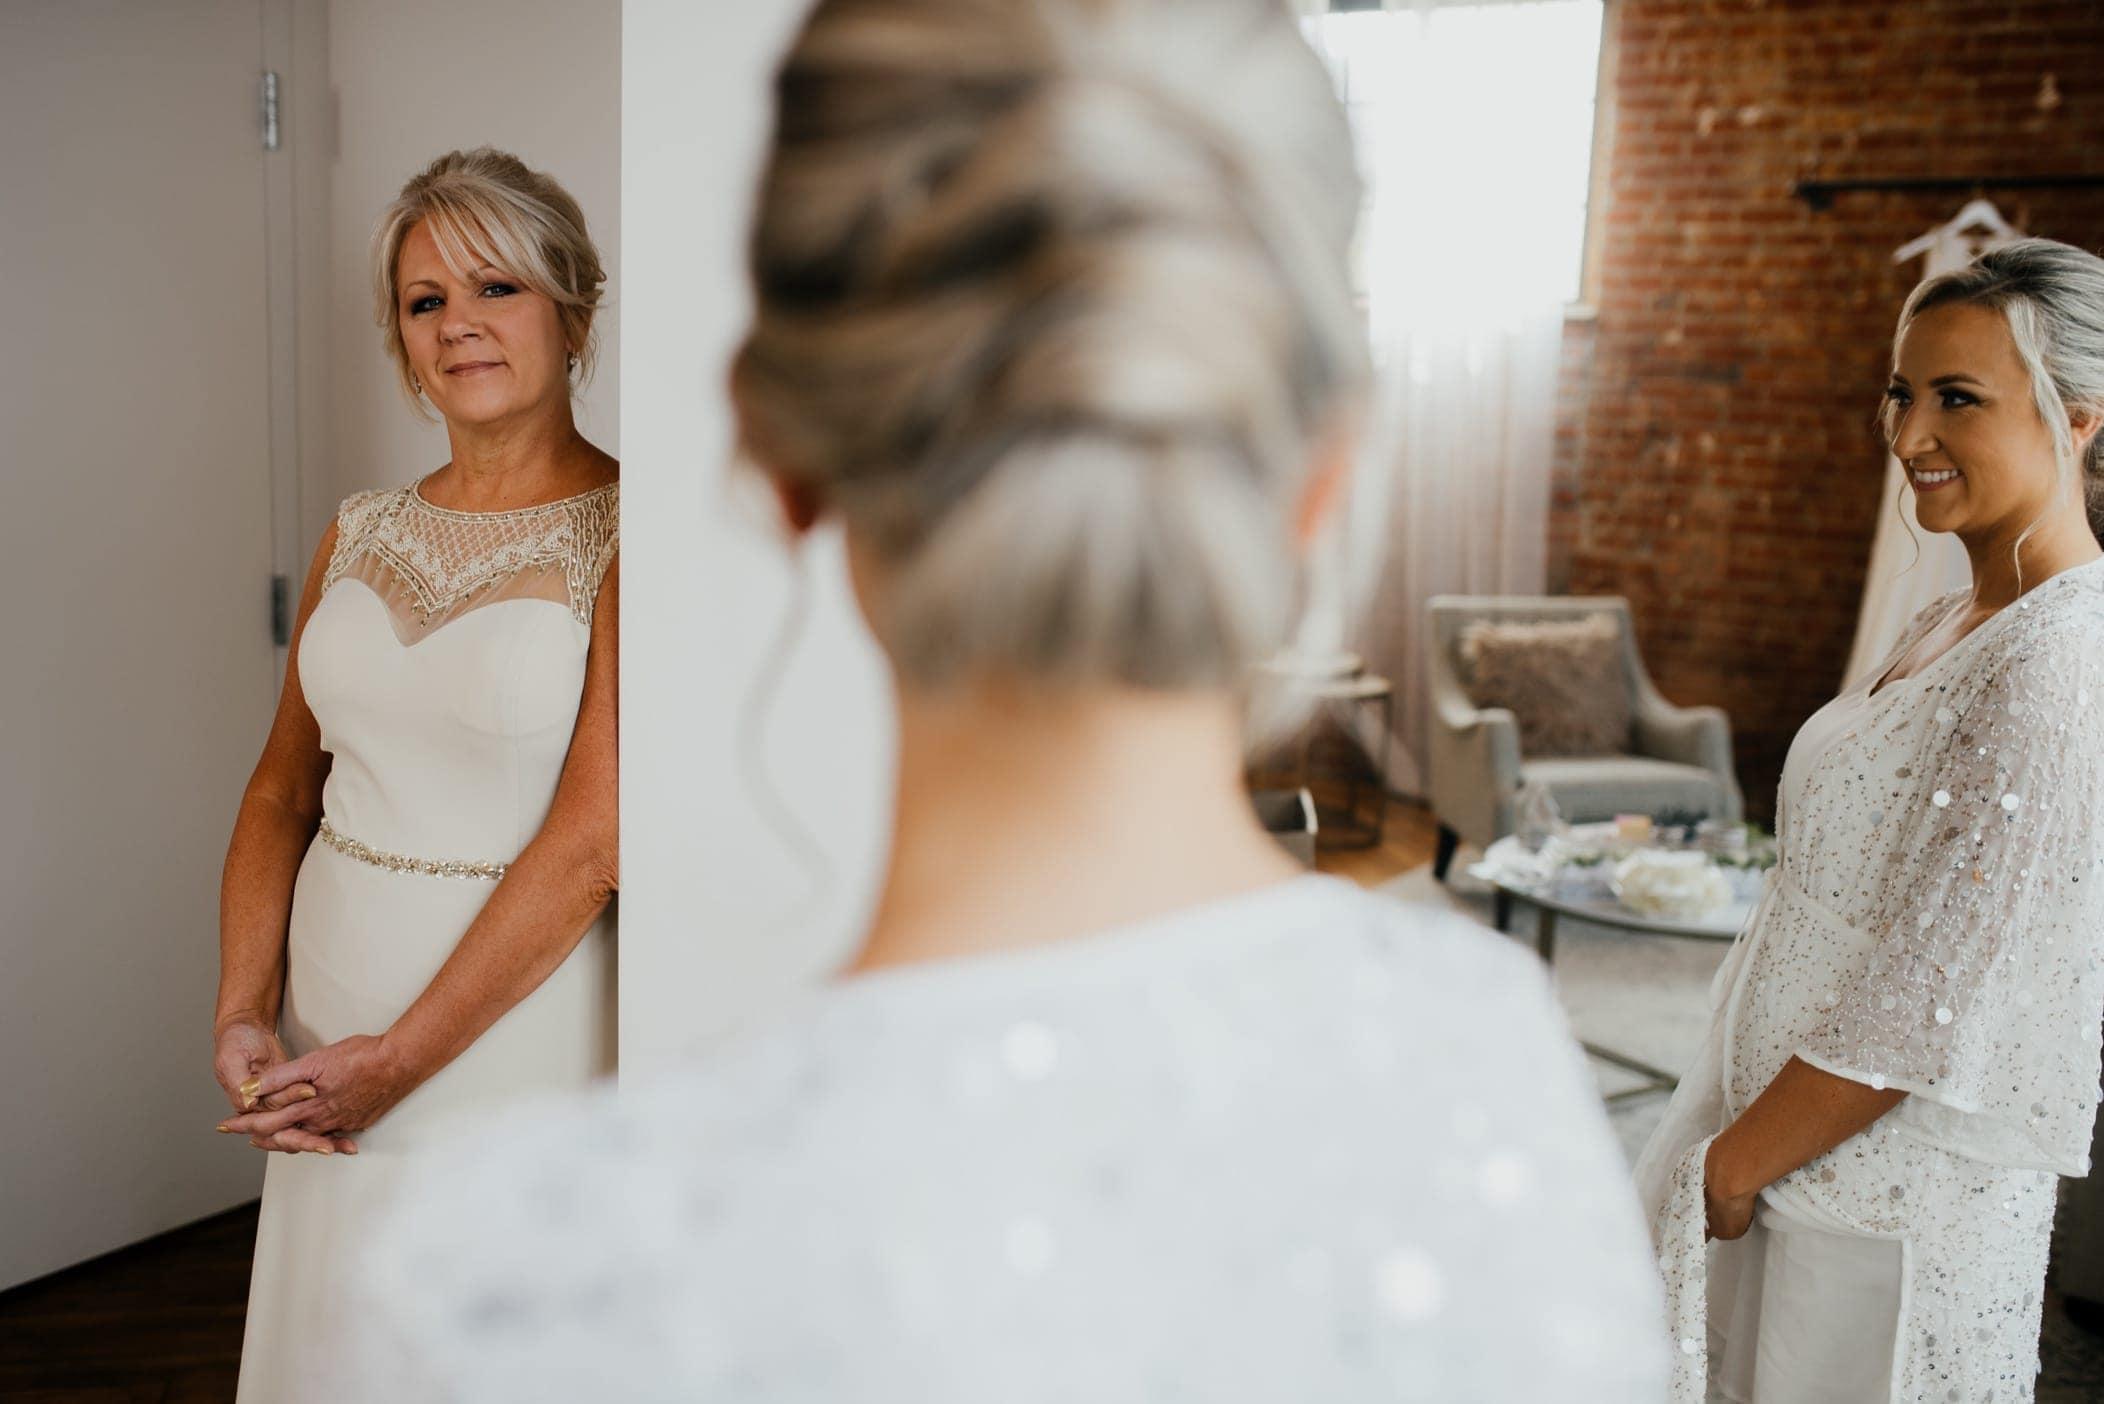 union kansas city wedding reception